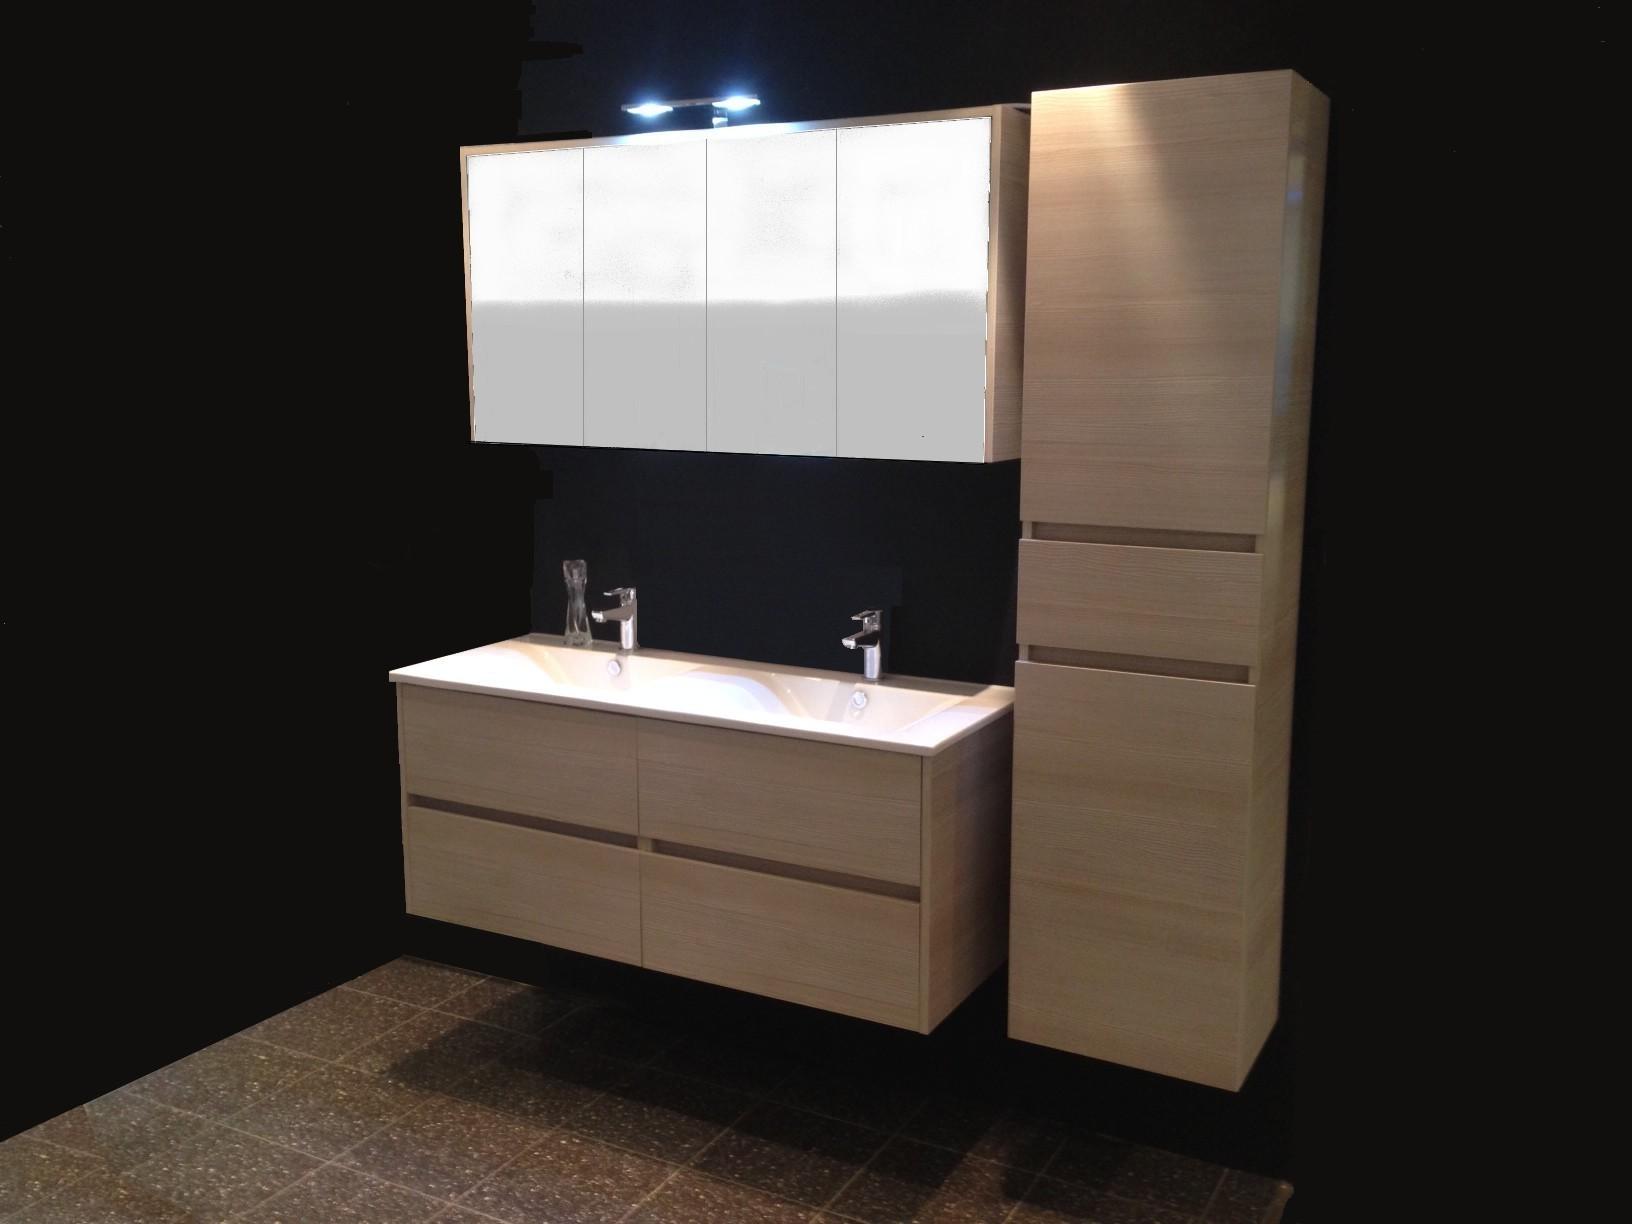 Meuble salle de bain avec armoire de toilette armoire for Meuble salle de bain armoire